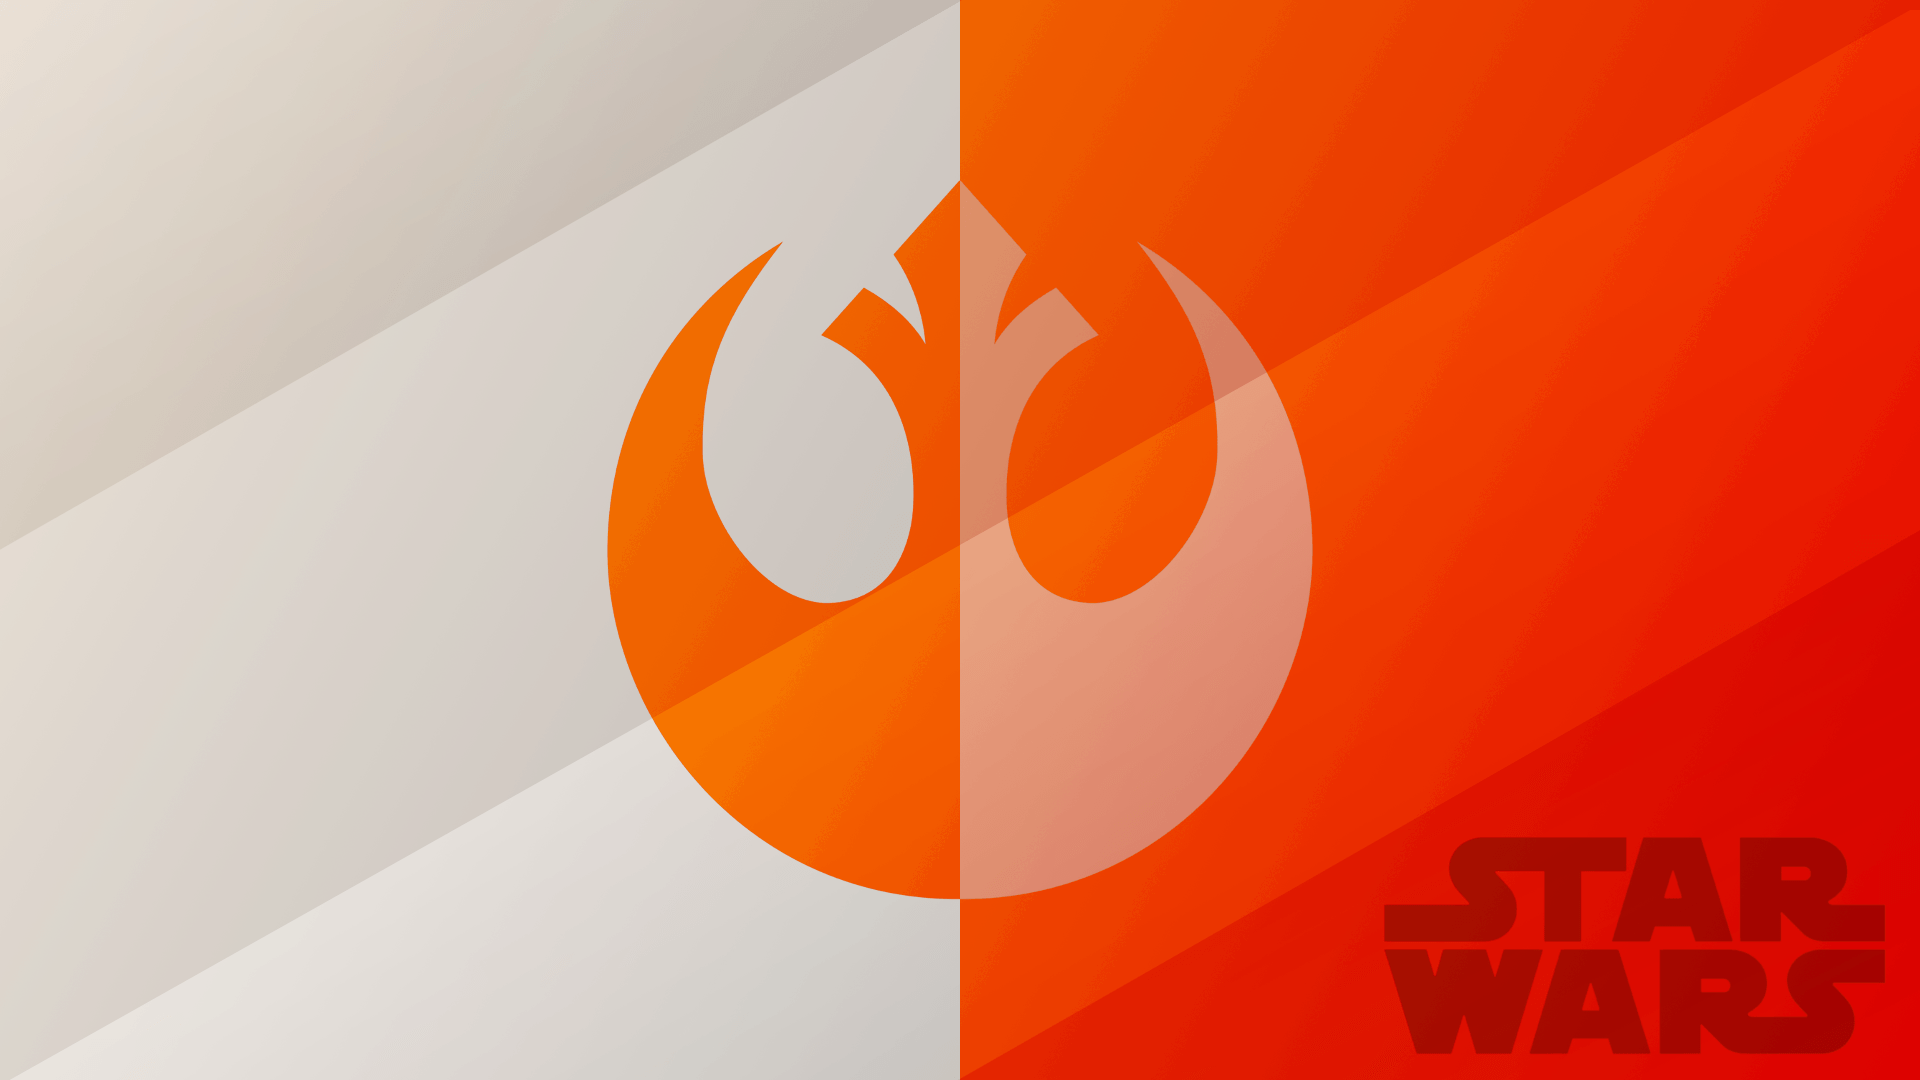 Star Wars Rebels Wallpapers Wallpaper Cave